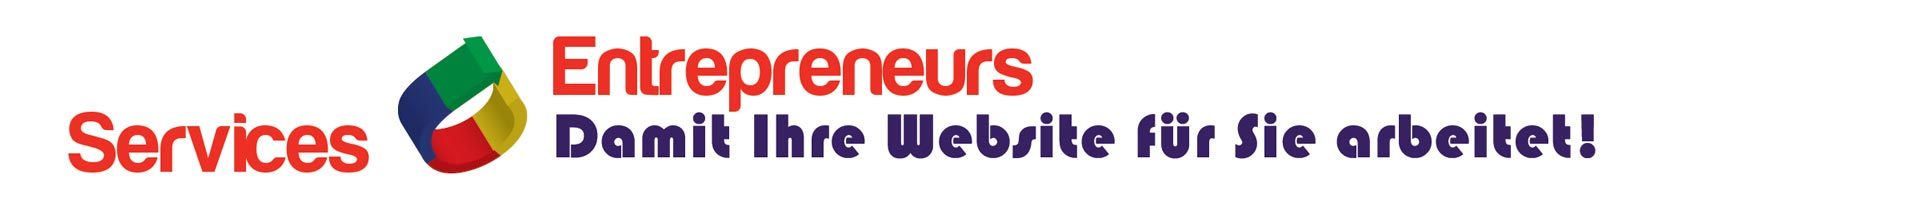 Services-Entrepreneurs Webdesign